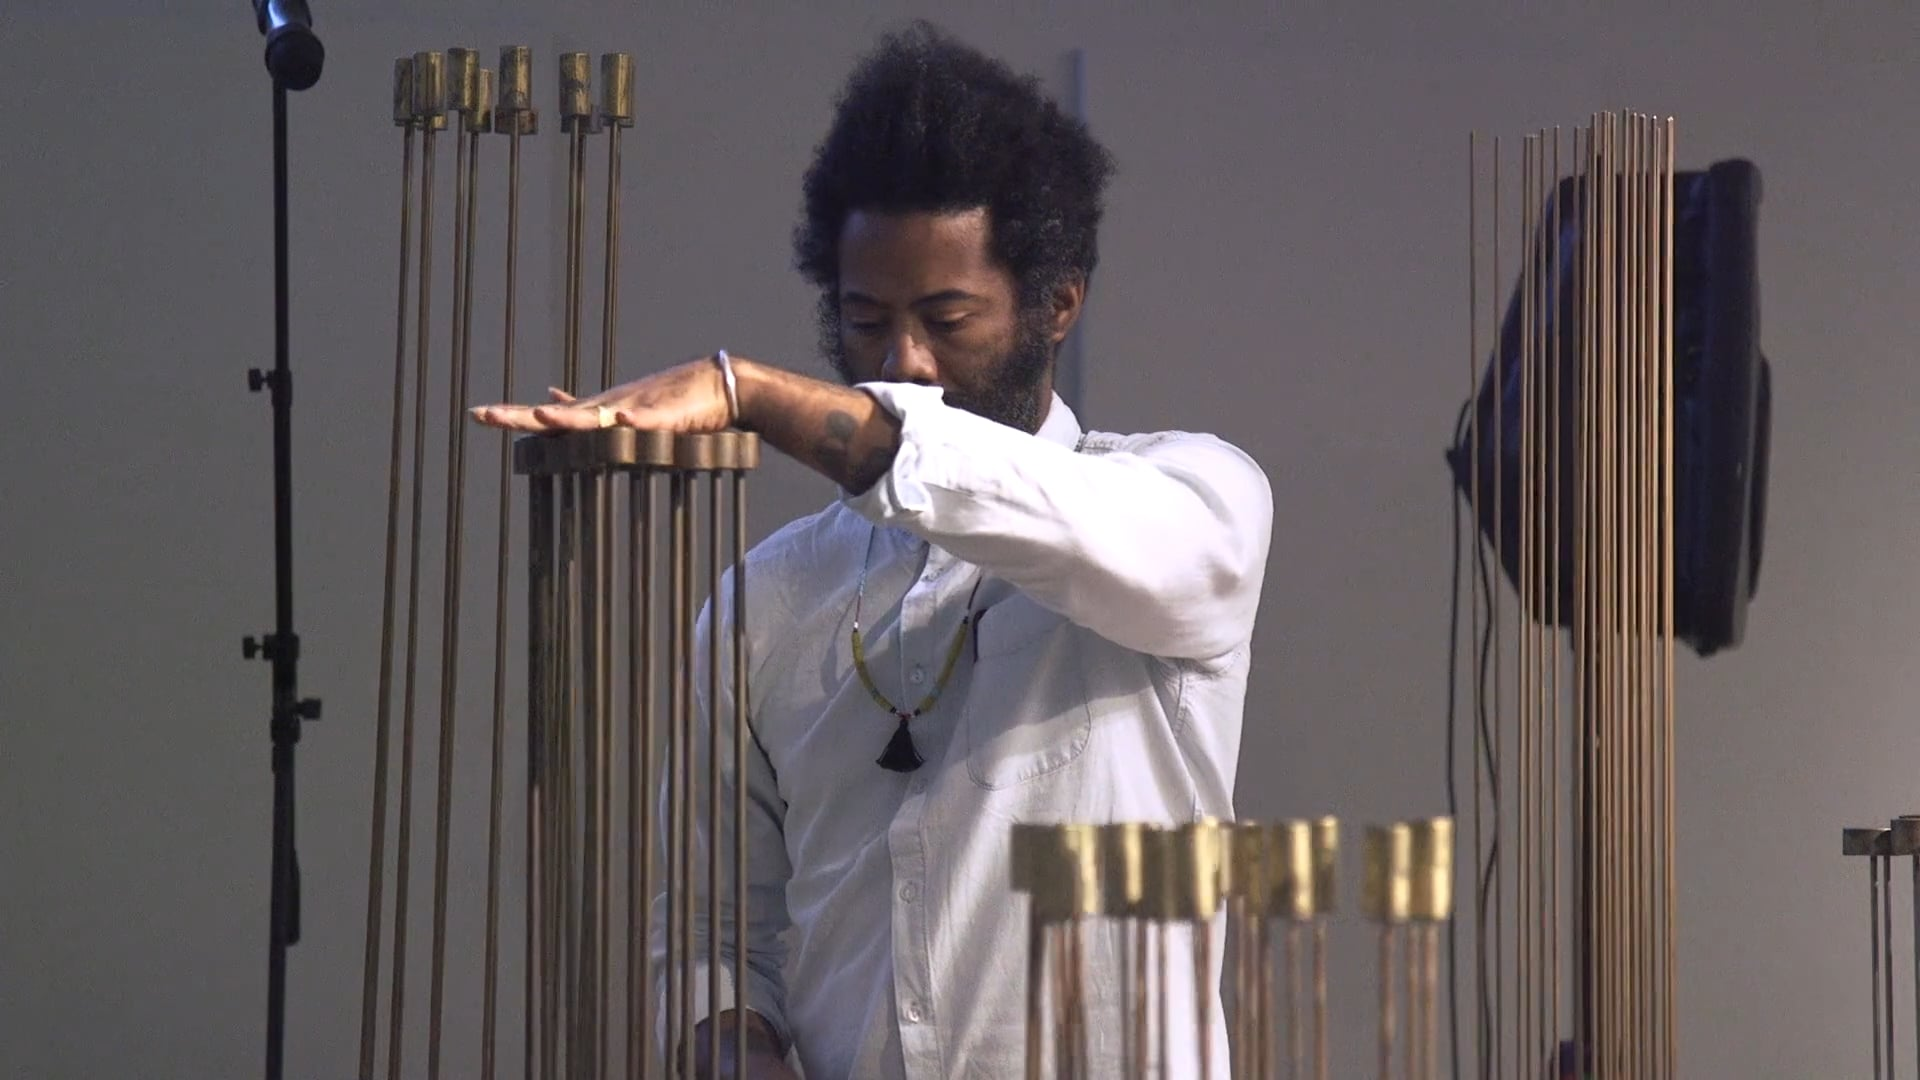 Bertoia Teaser: Robert Aiki Aubrey Lowe performs at MAD